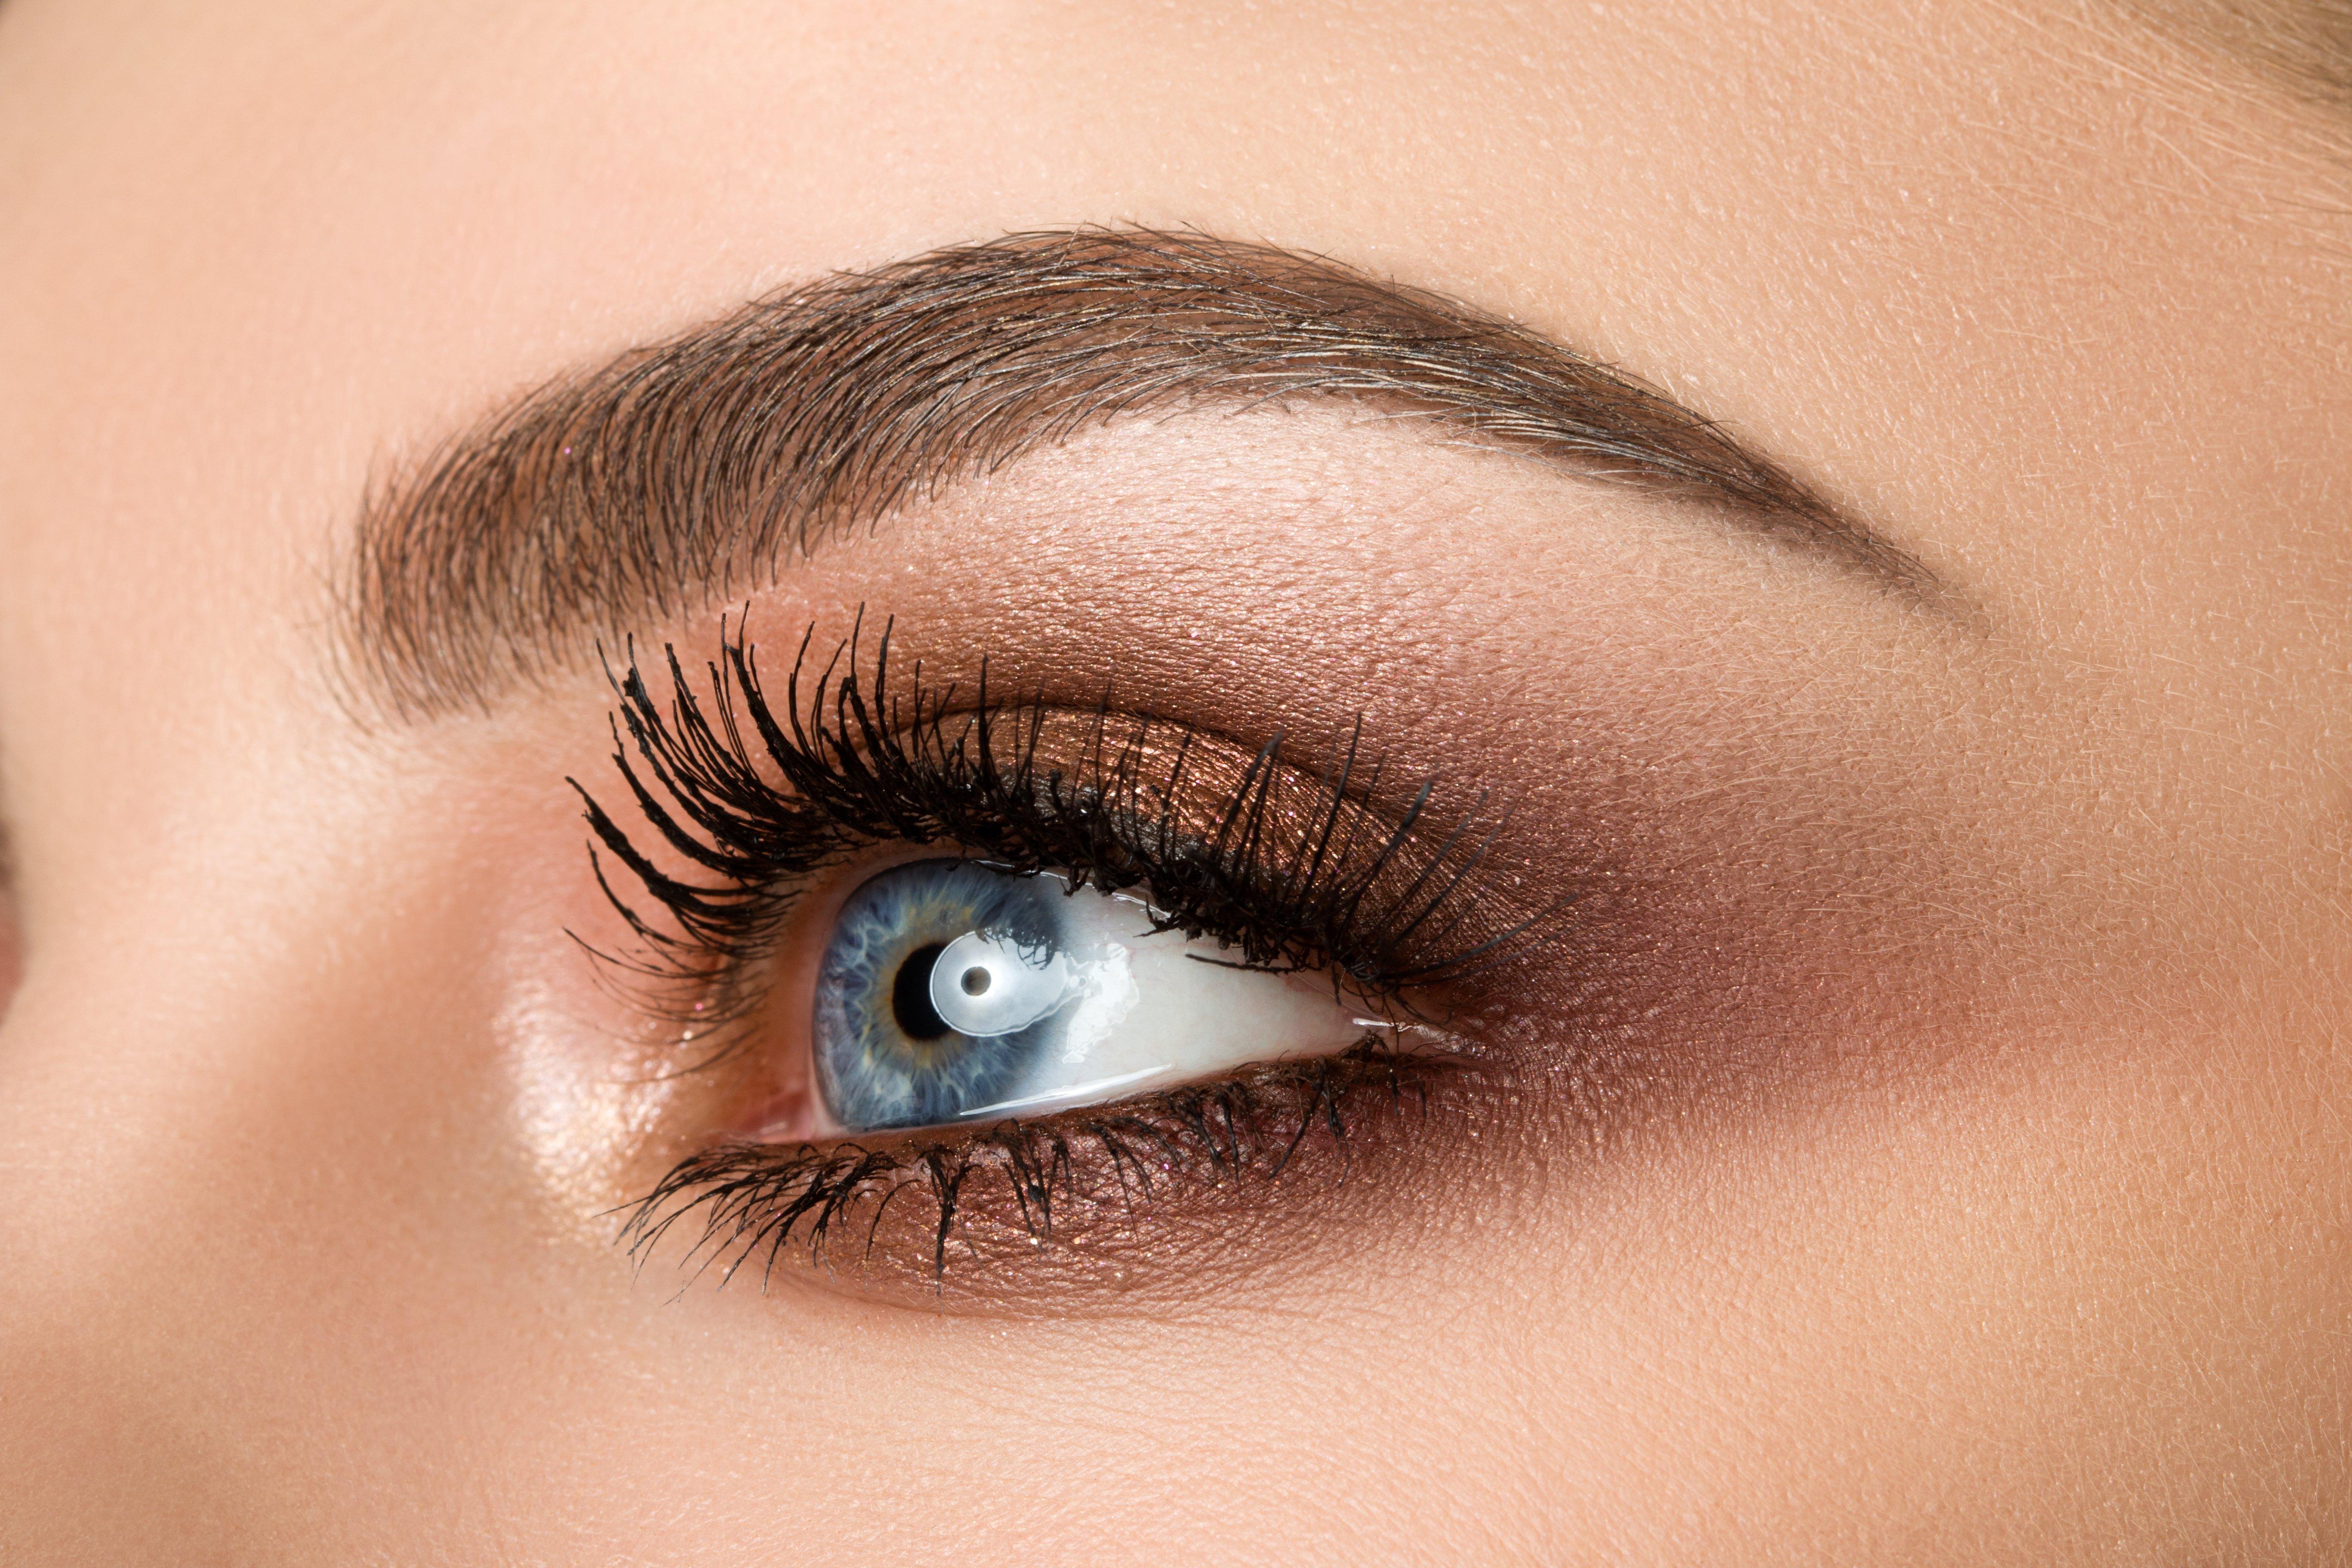 Mujer con cejas perfectas.   Foto: Shutterstock